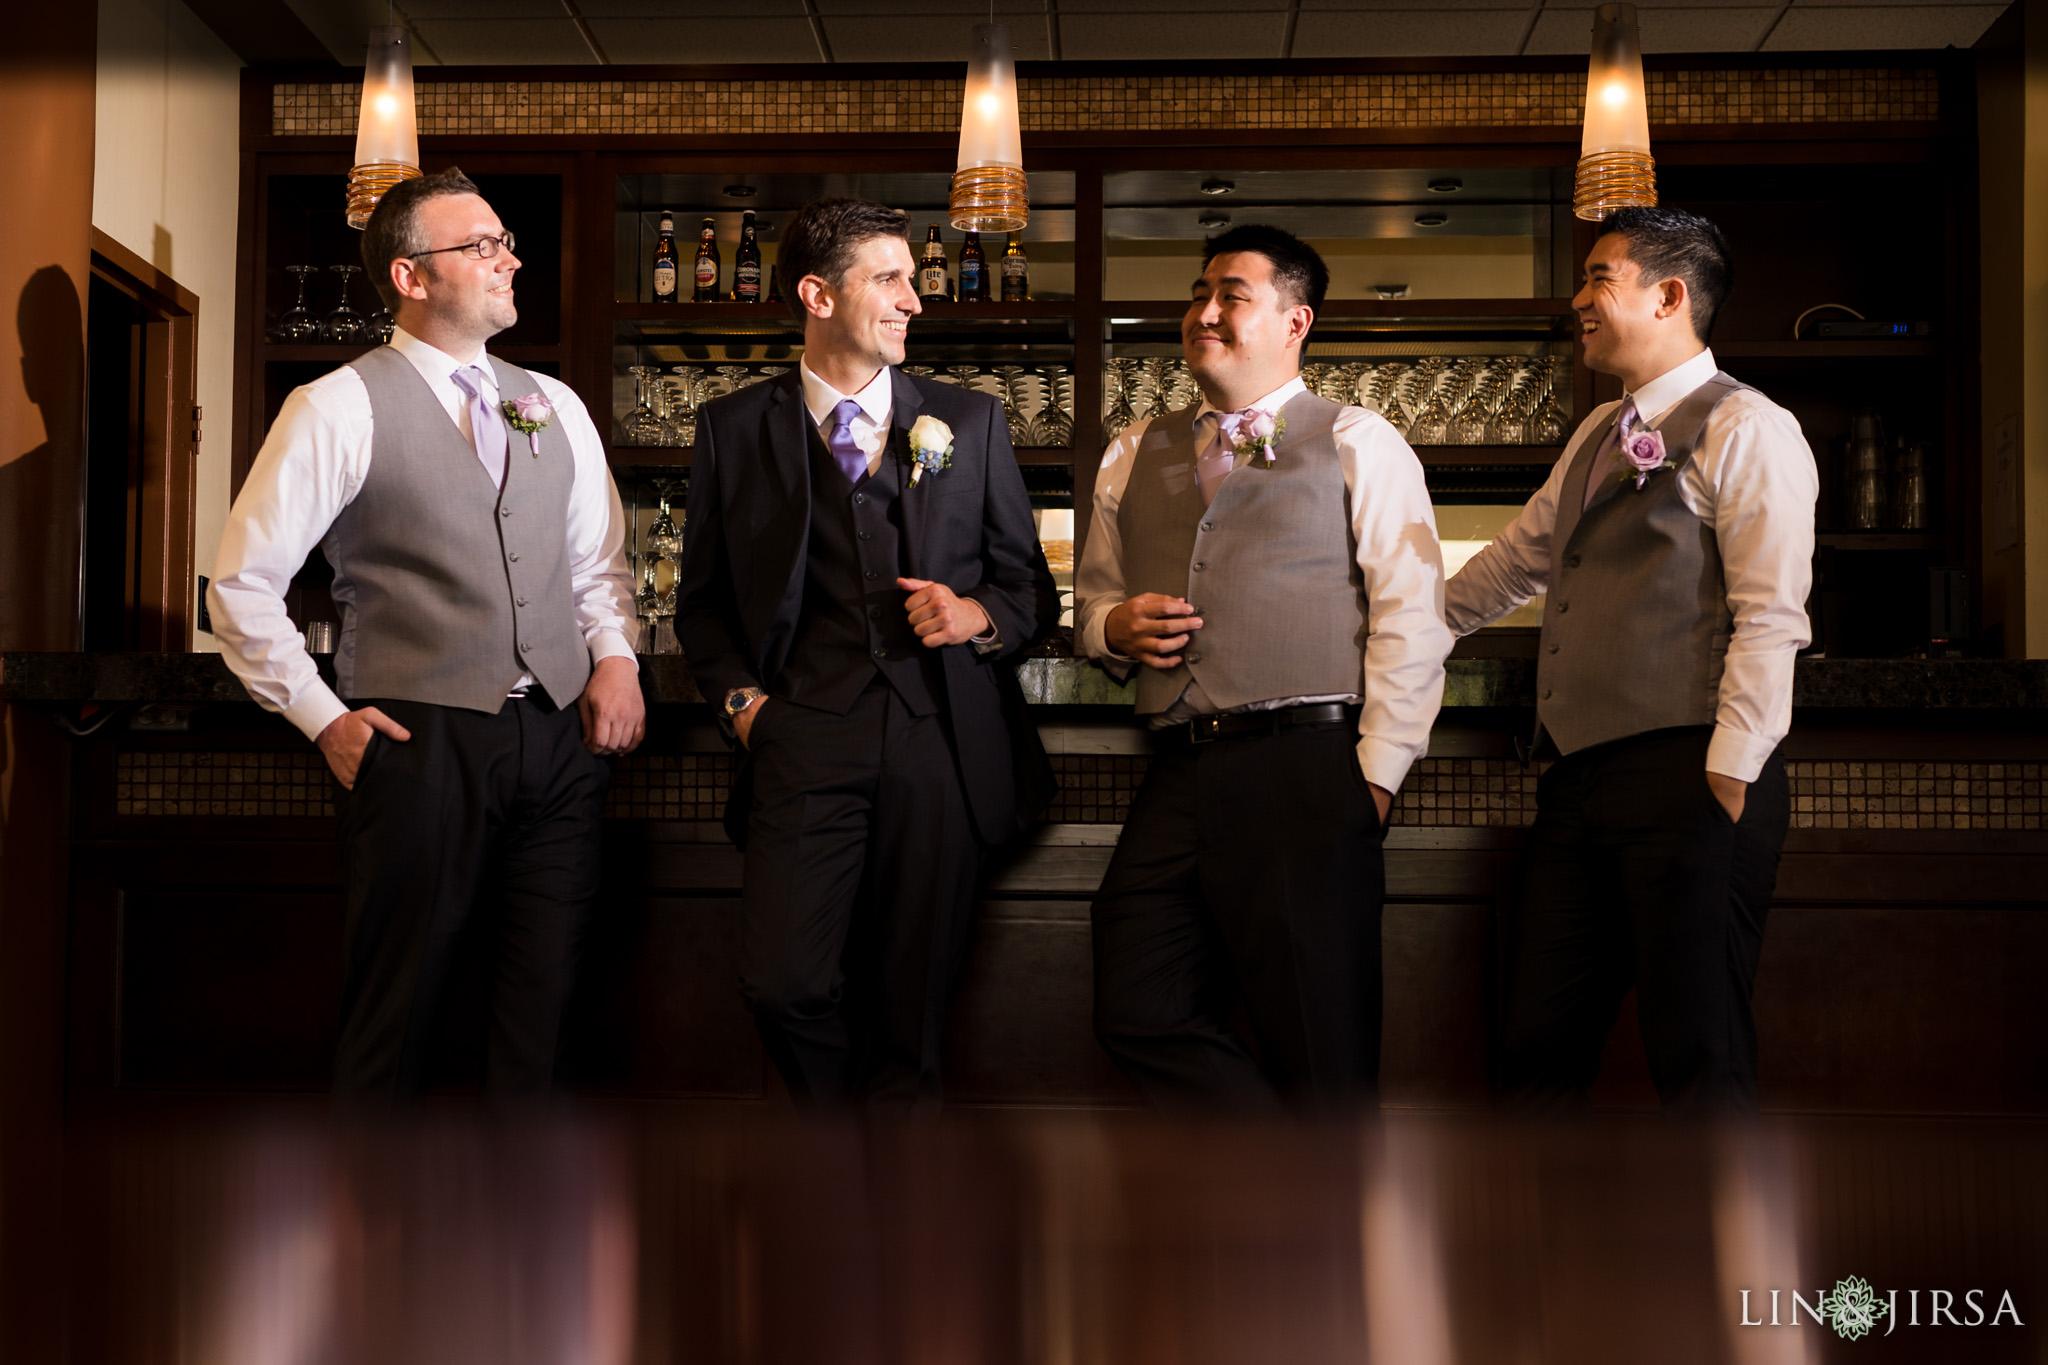 09 seacliff country club huntington beach groomsmen wedding photography